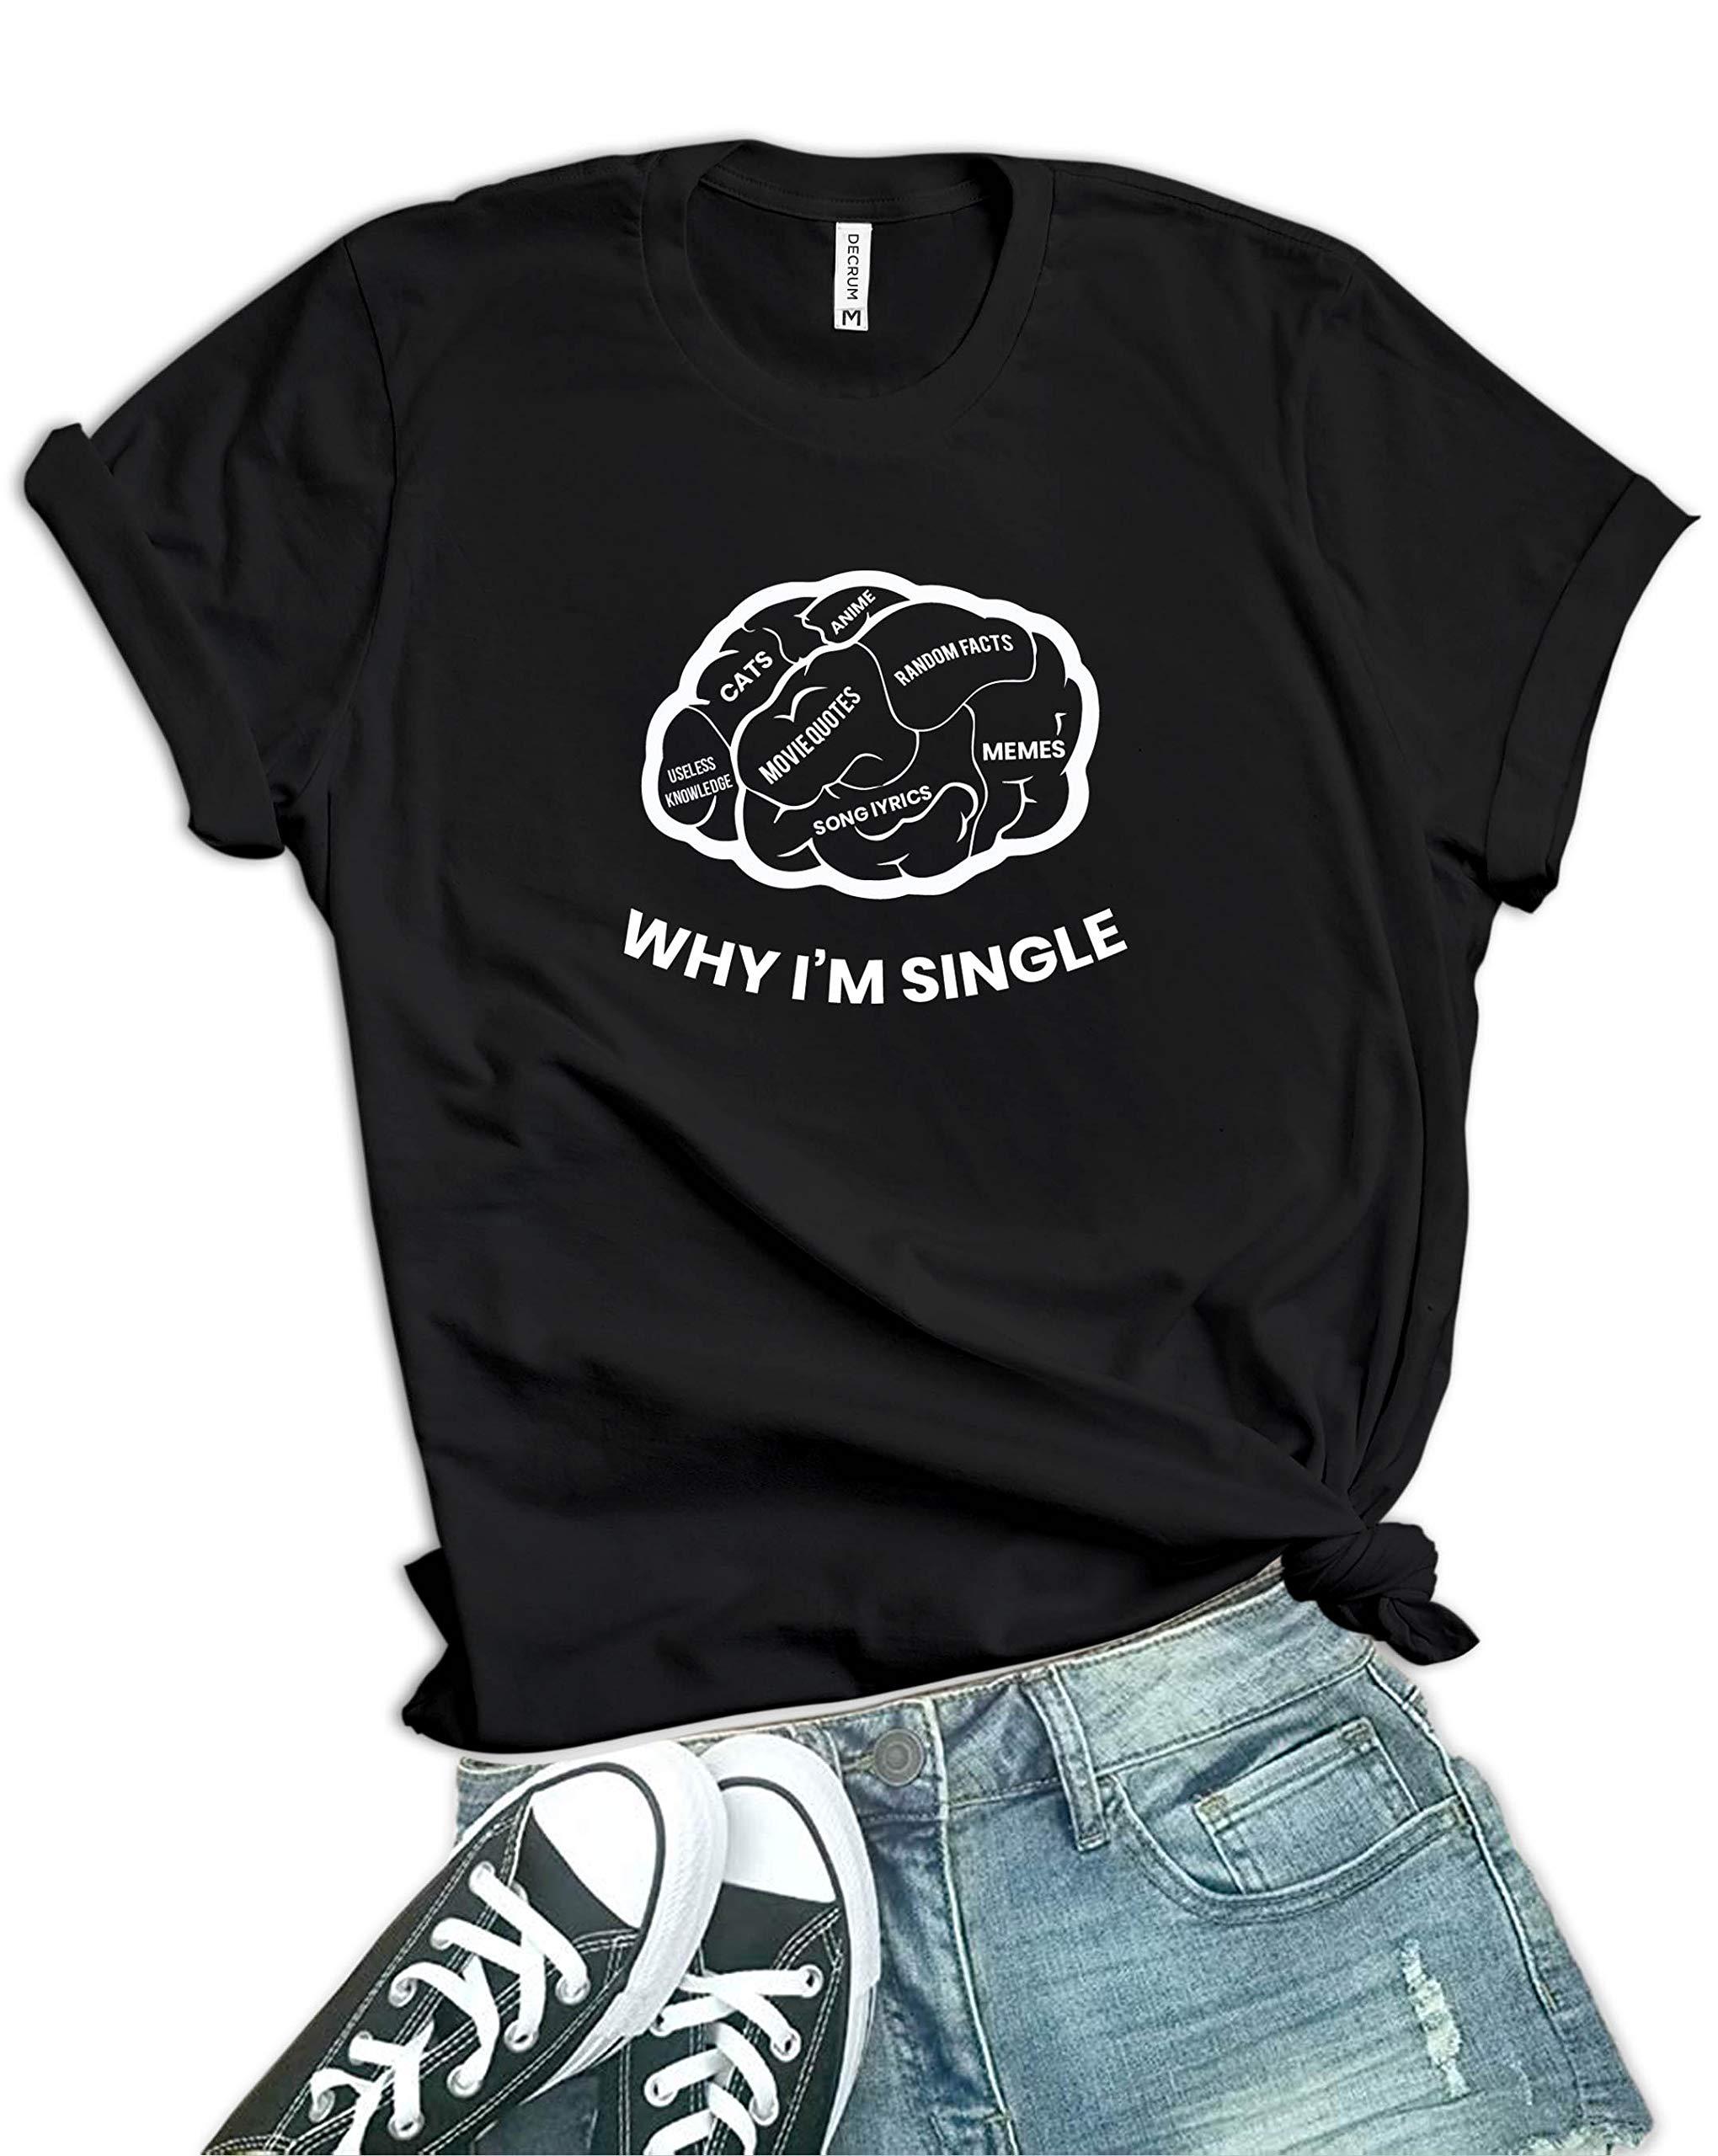 Decrum Why I'm Single Shirt Funny Womens Graphic Tees